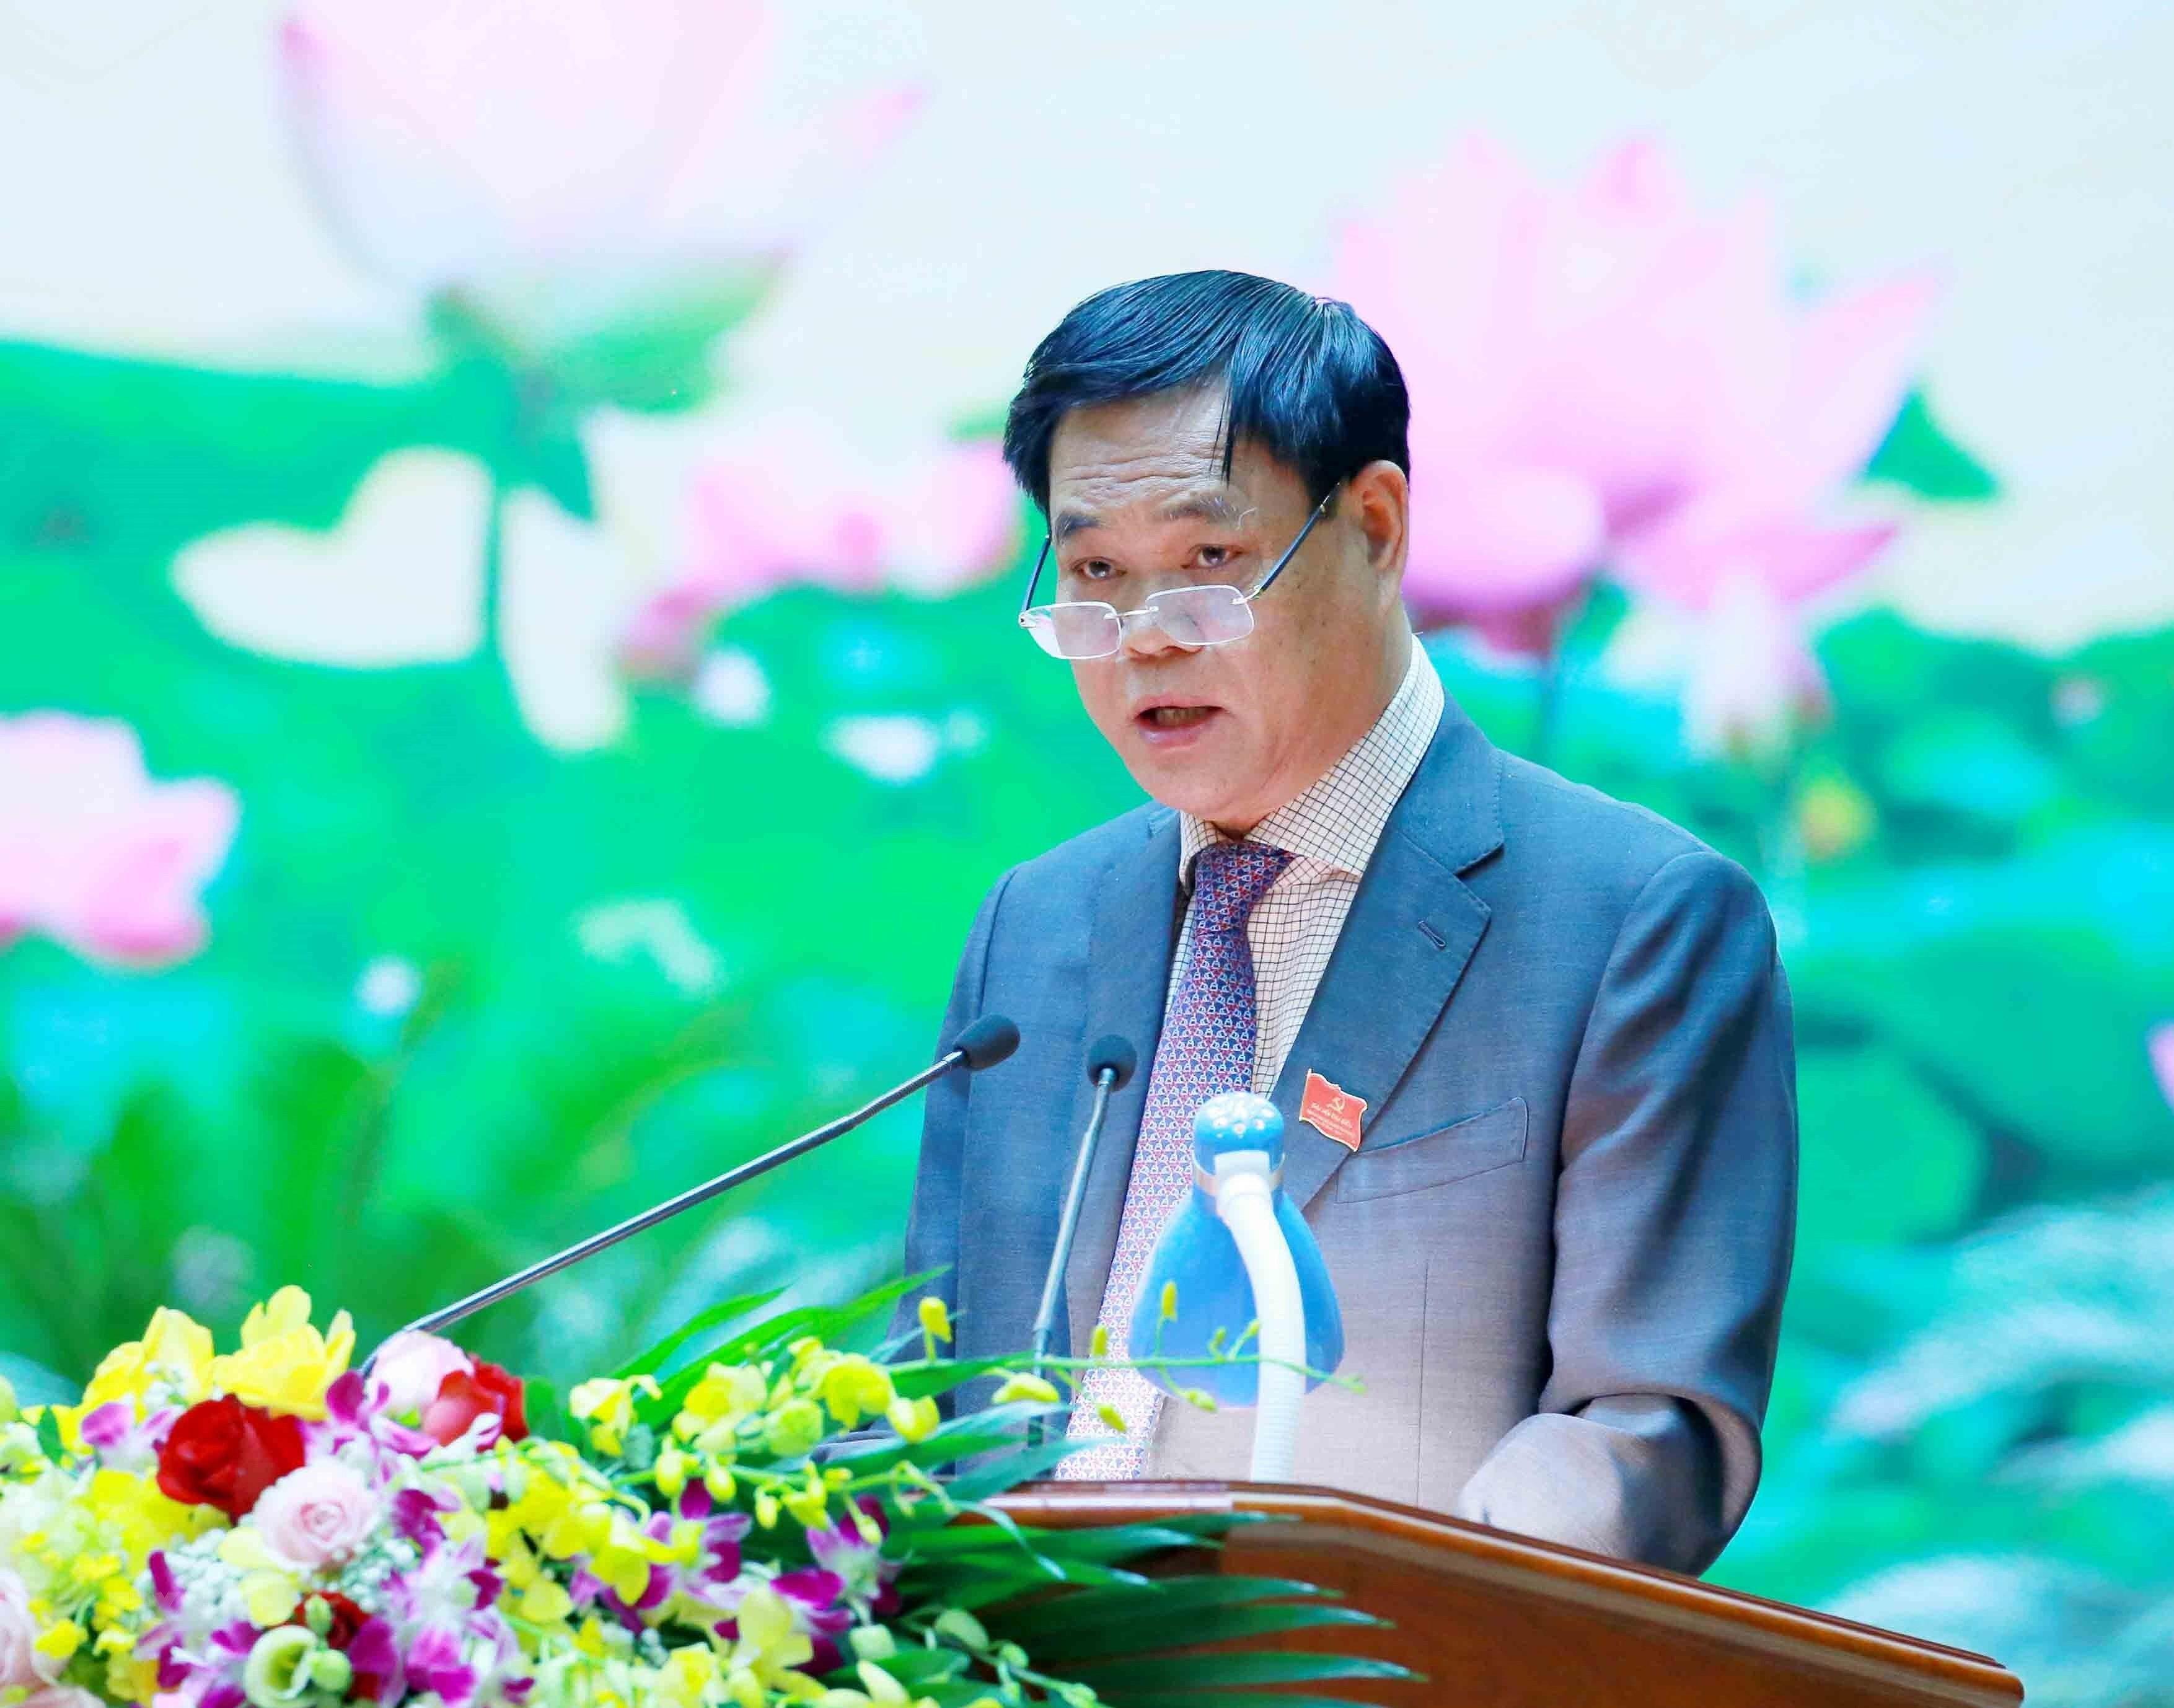 Ong Huynh Tan Viet giu chuc Bi thu Dang uy Khoi cac co quan Trung Uong hinh anh 1